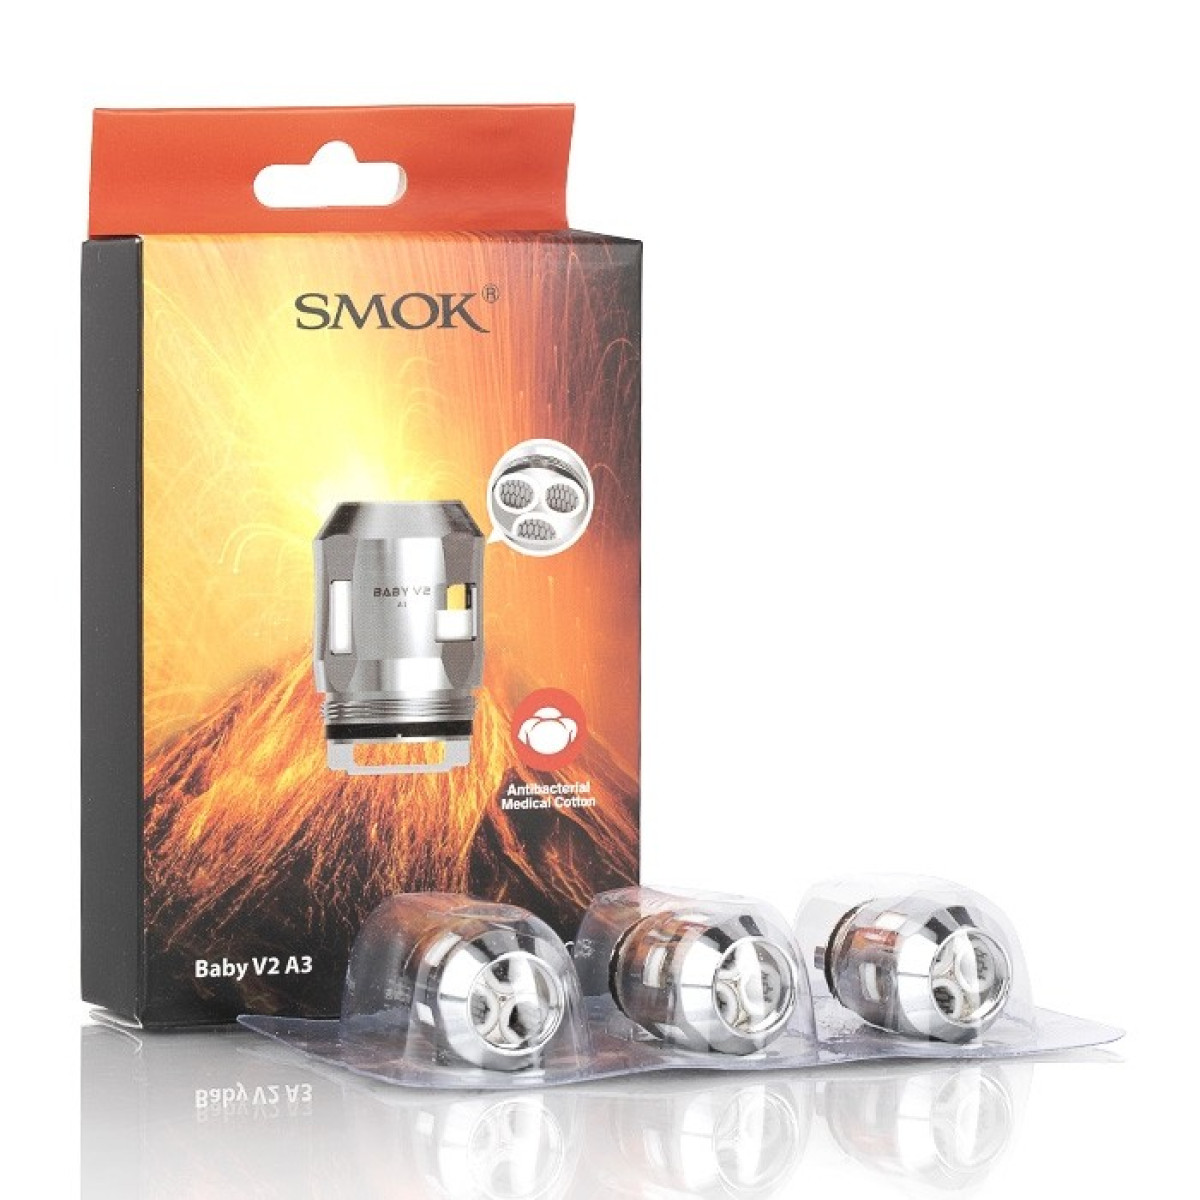 SMOK TFV8 BABY V2 A3 COILS